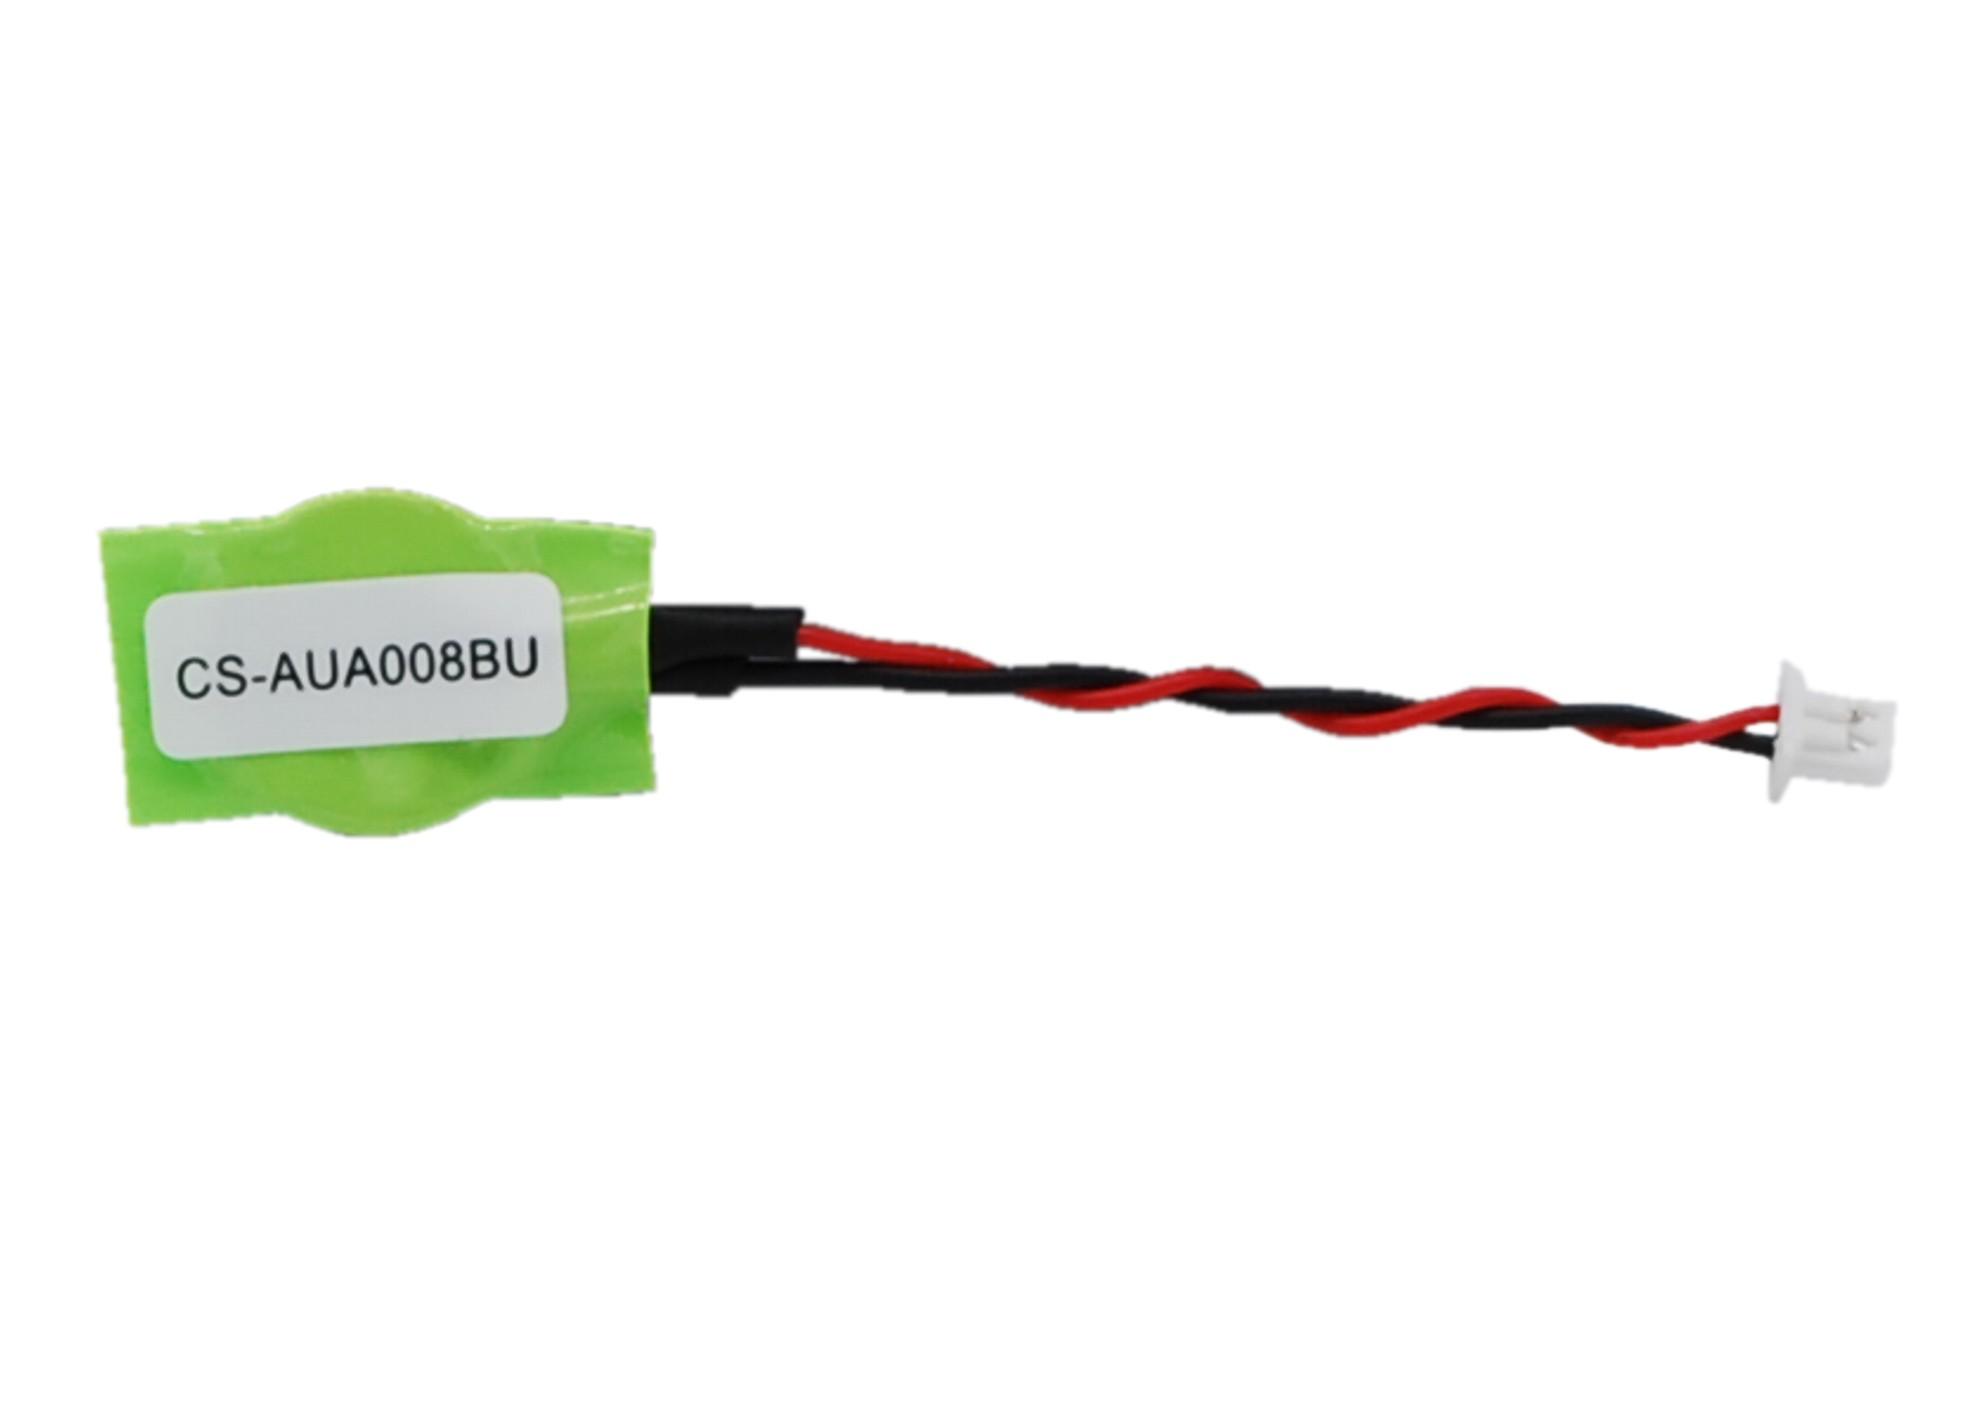 Cameron Sino baterie cmos pro ASUS Eee PC 1005HA-PU1X 3V Li-ion 40mAh zelená - neoriginální